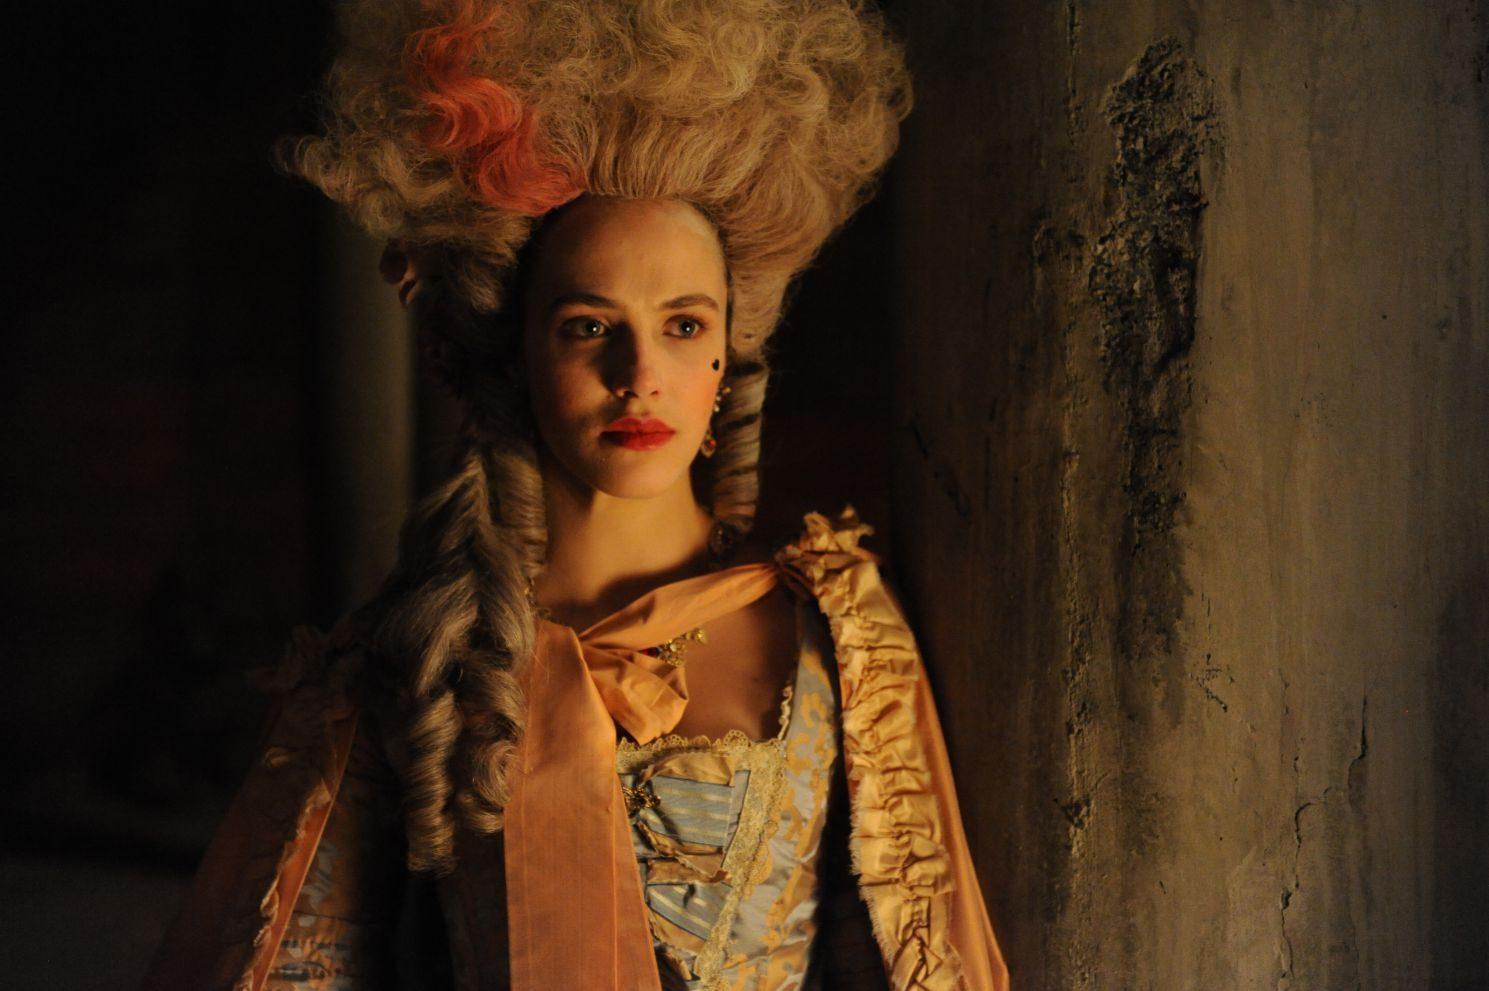 FOX PREMIUM - HARLOTS - Jessica Brown Findlay es Charlotte Wells